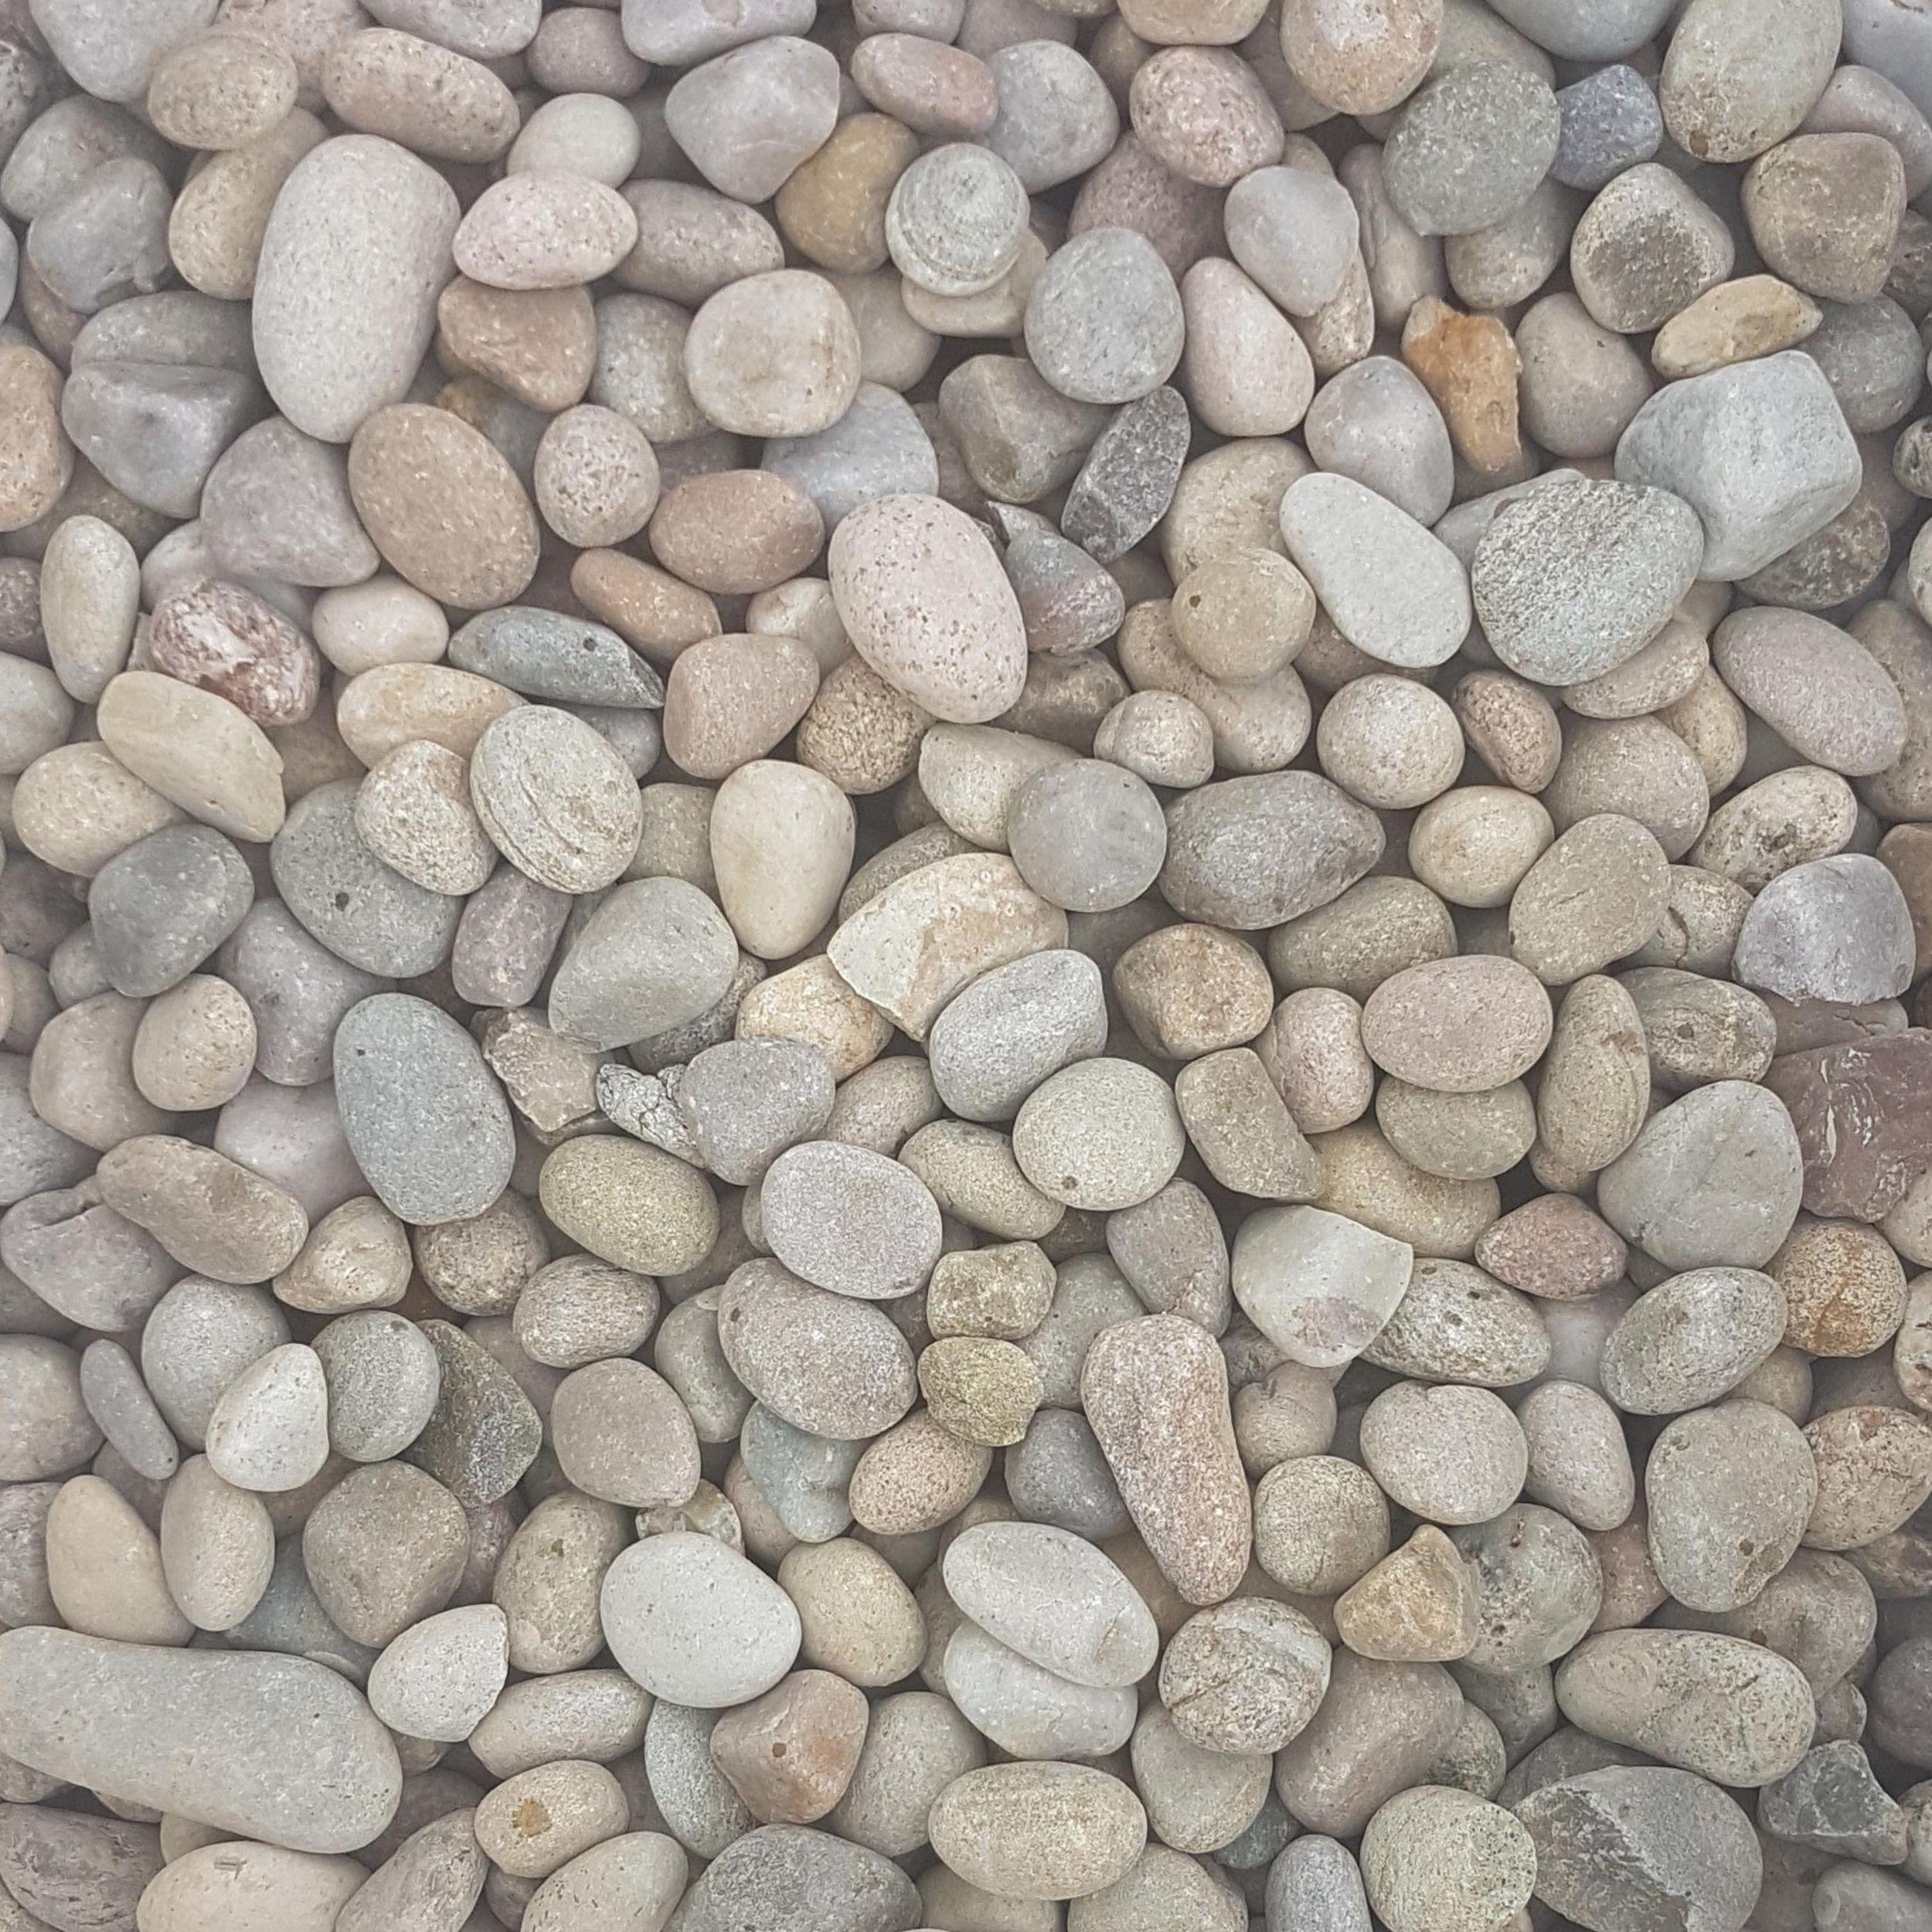 scottish beach pebbles dry 30mm 50mm mitchell turf